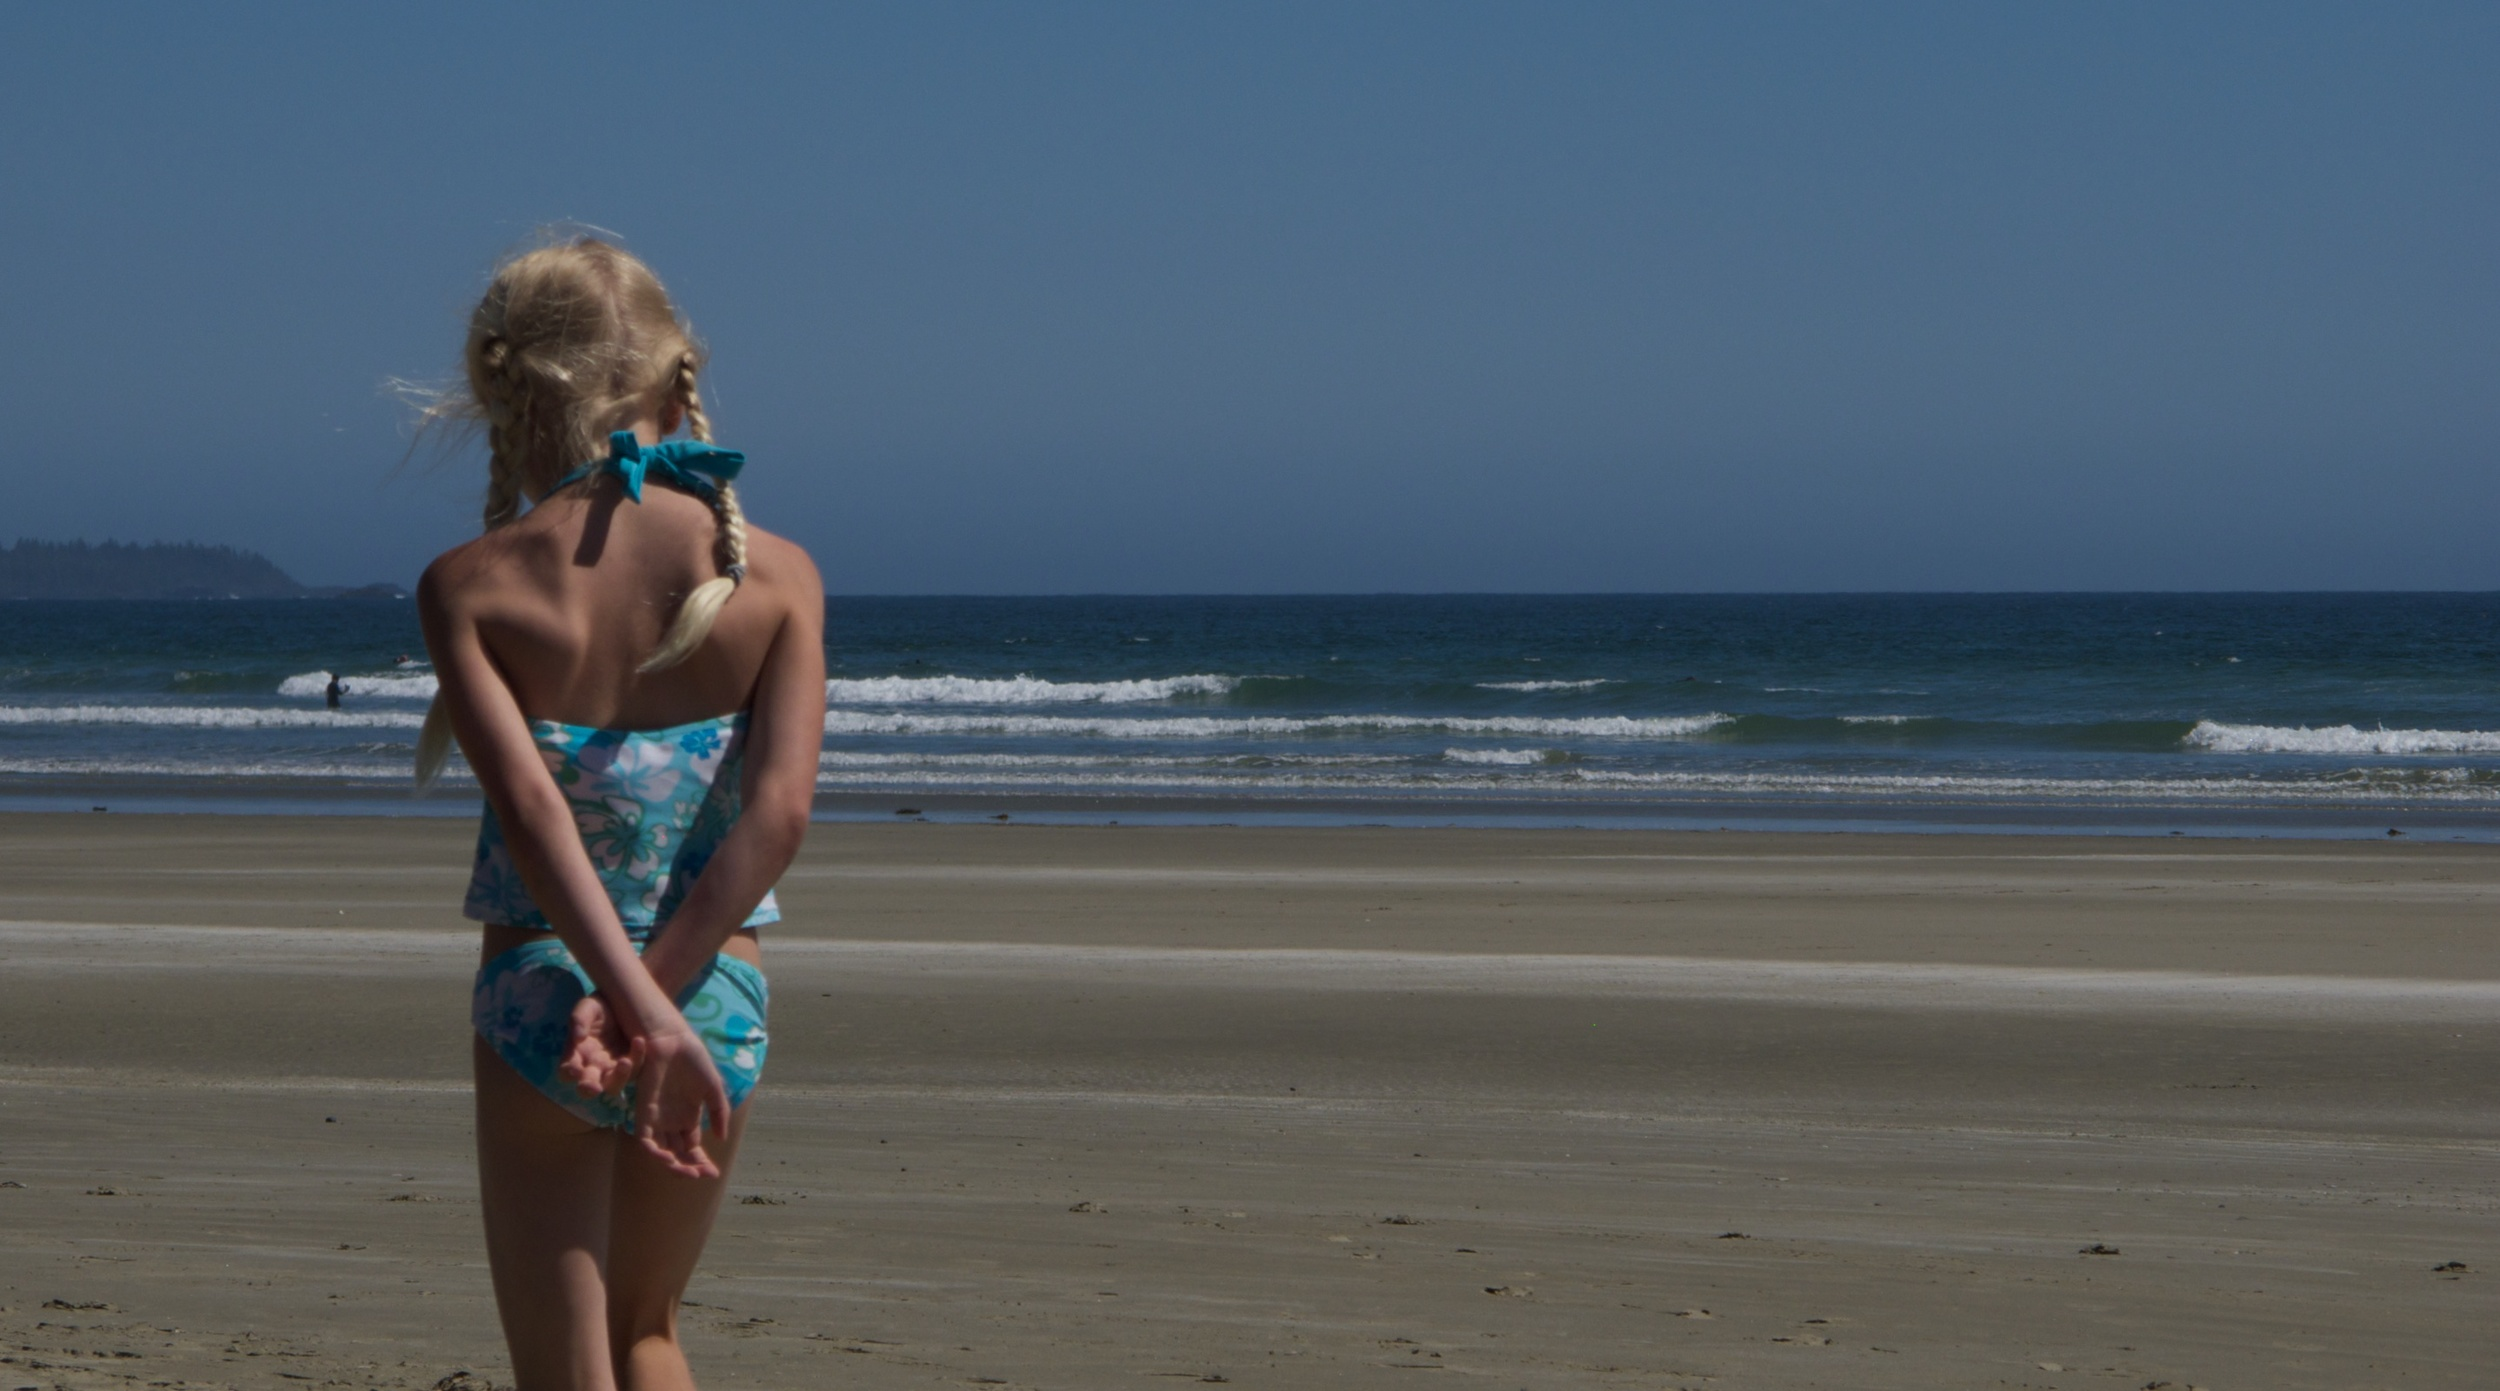 2010-07-06 at 14-29-50 Back, Beach, Blue, Girl, Long Beach, Ocean, Portrait, Sand, Thought.jpg